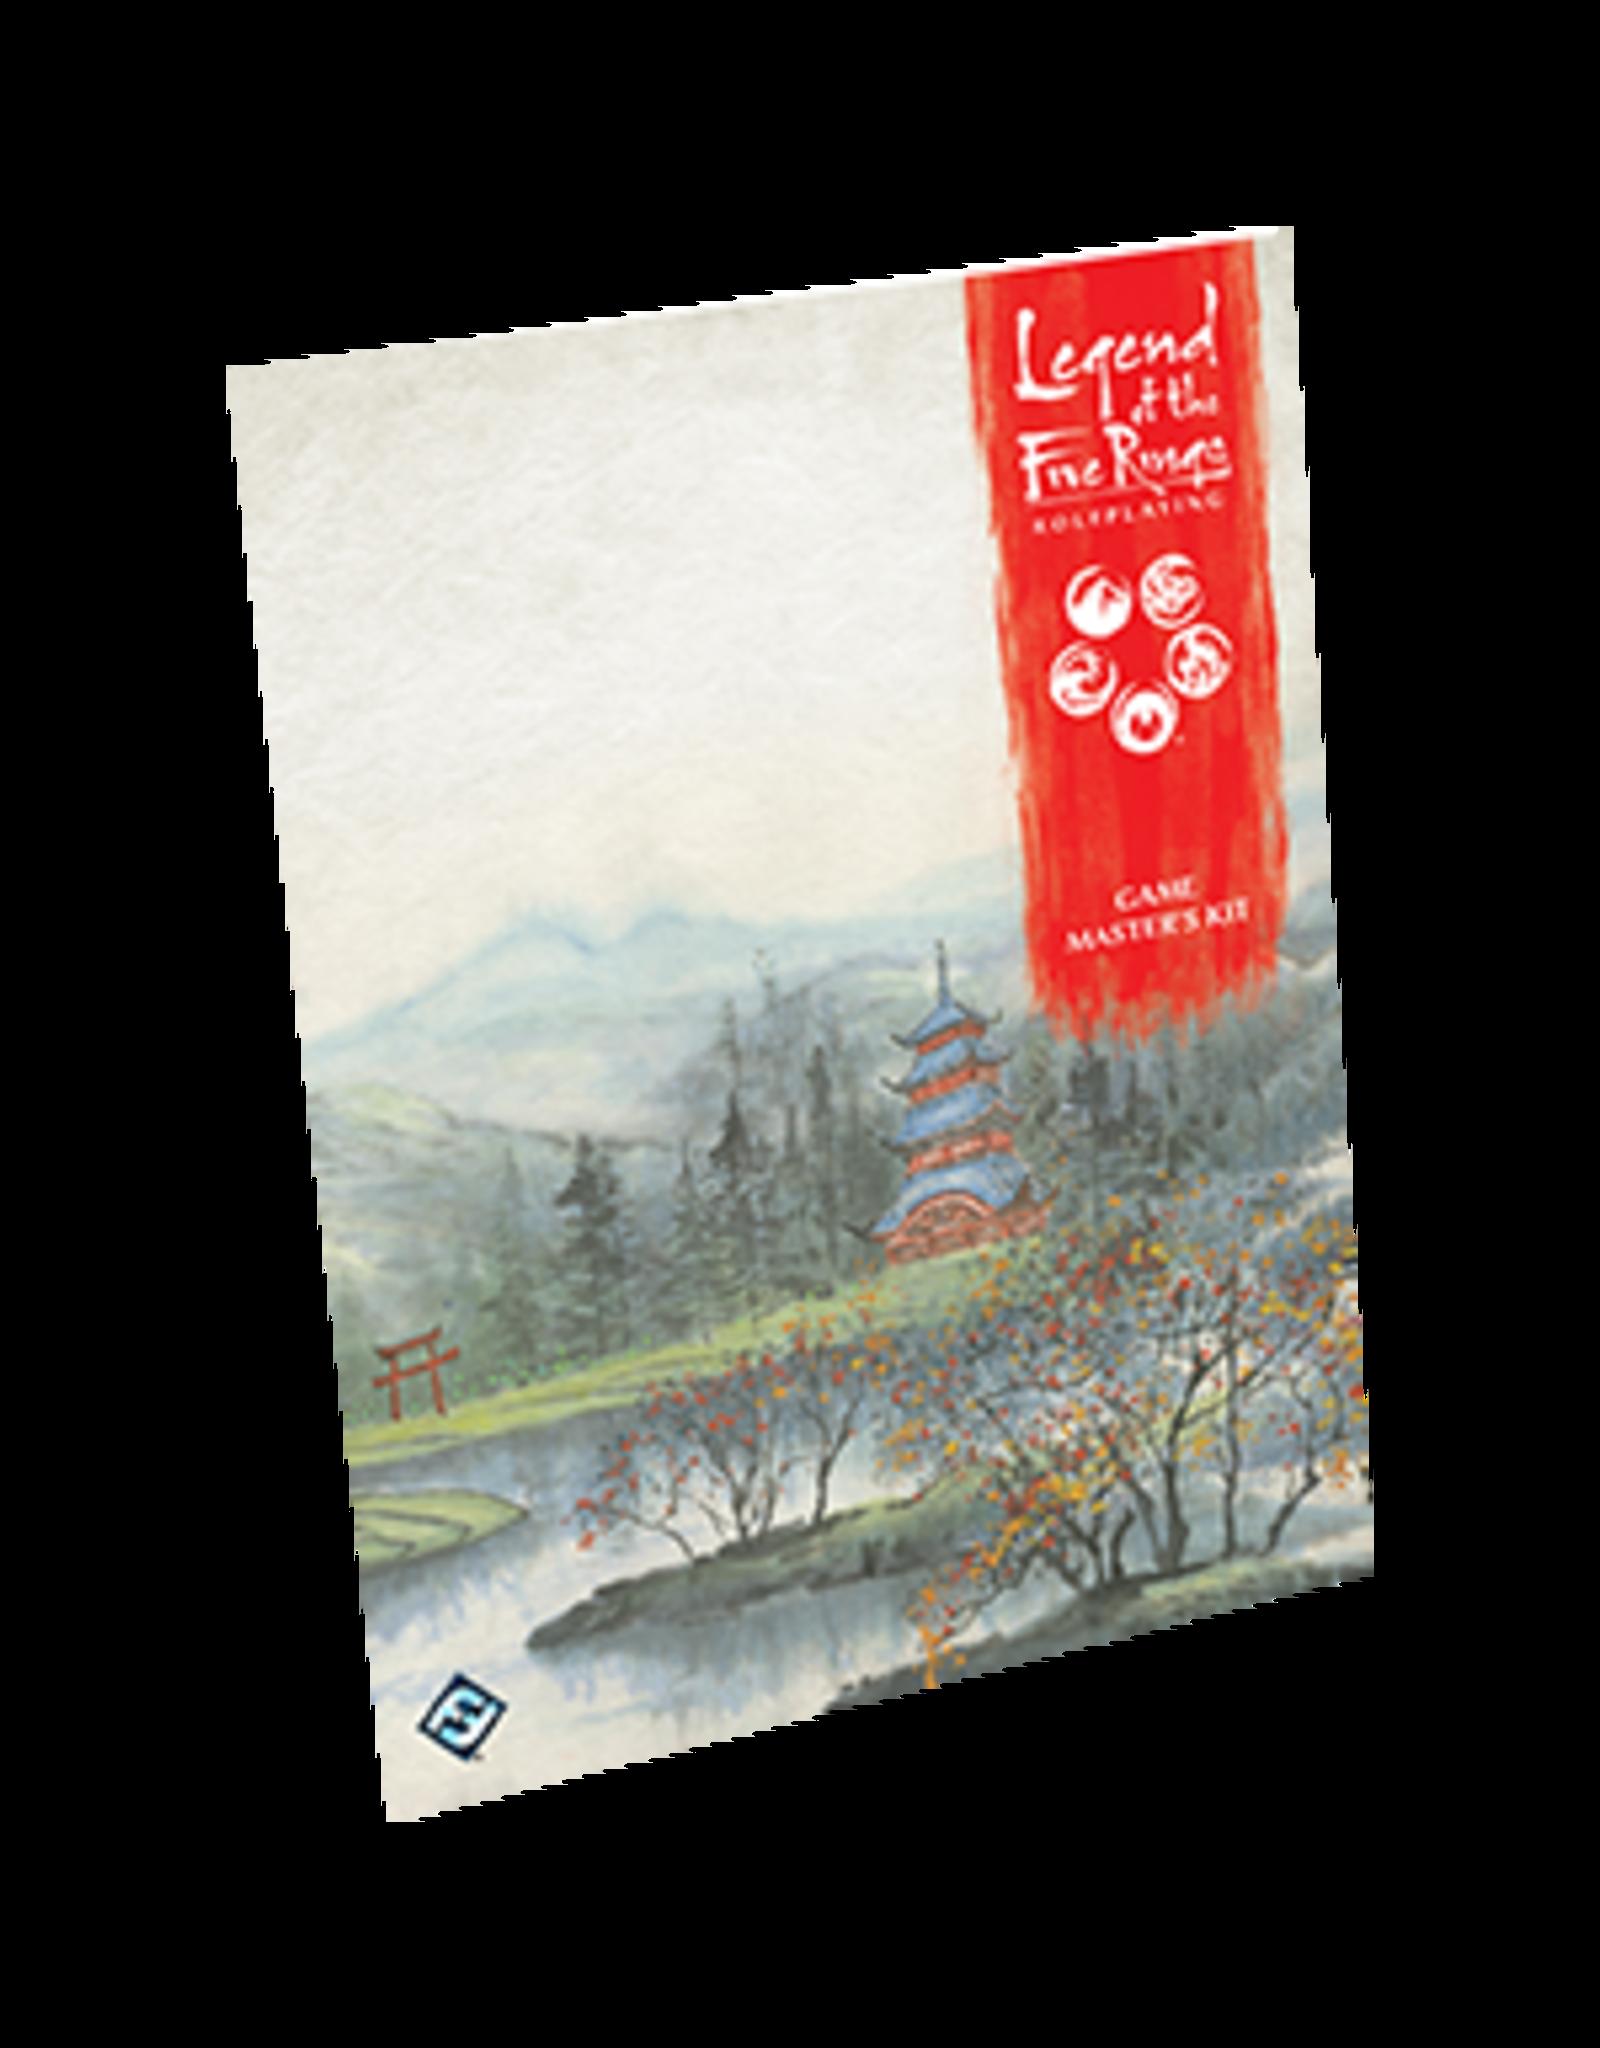 Fantasy Flight Games Legend of the Five Rings RPG: Game Master's Kit